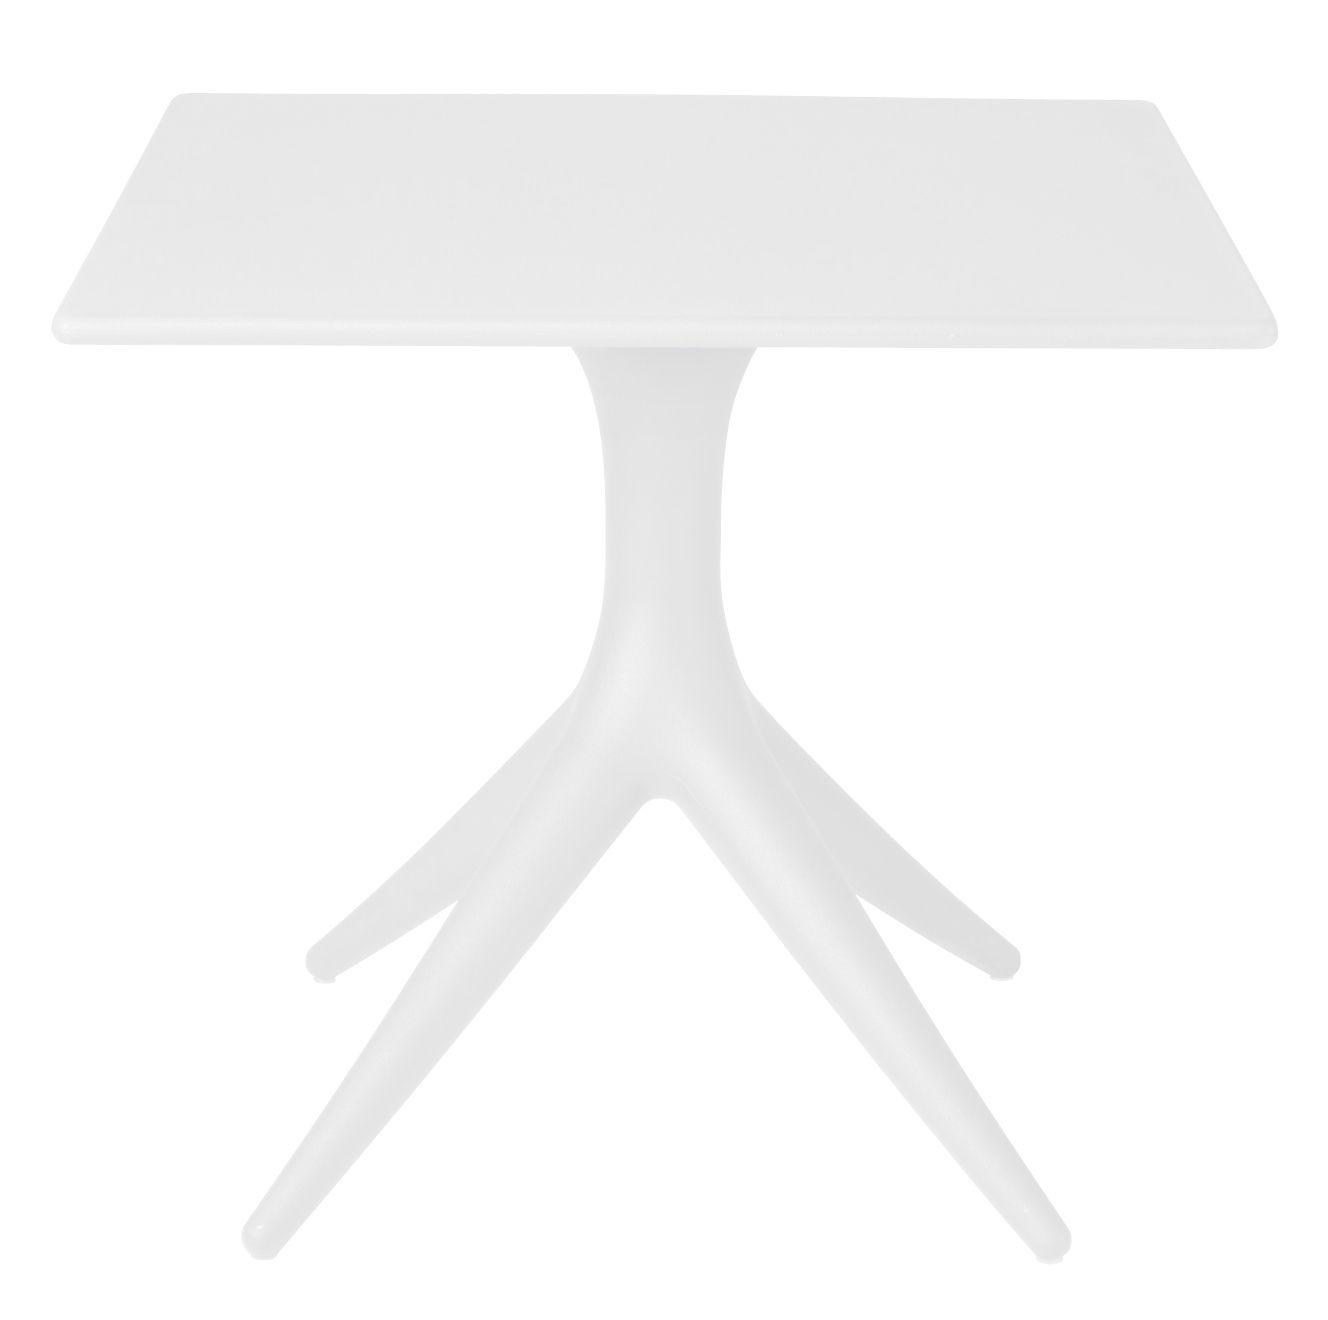 Outdoor - Tables de jardin - Table carrée App / 80 x 80 cm - Driade - Blanc - Polyéthylène rotomoulé